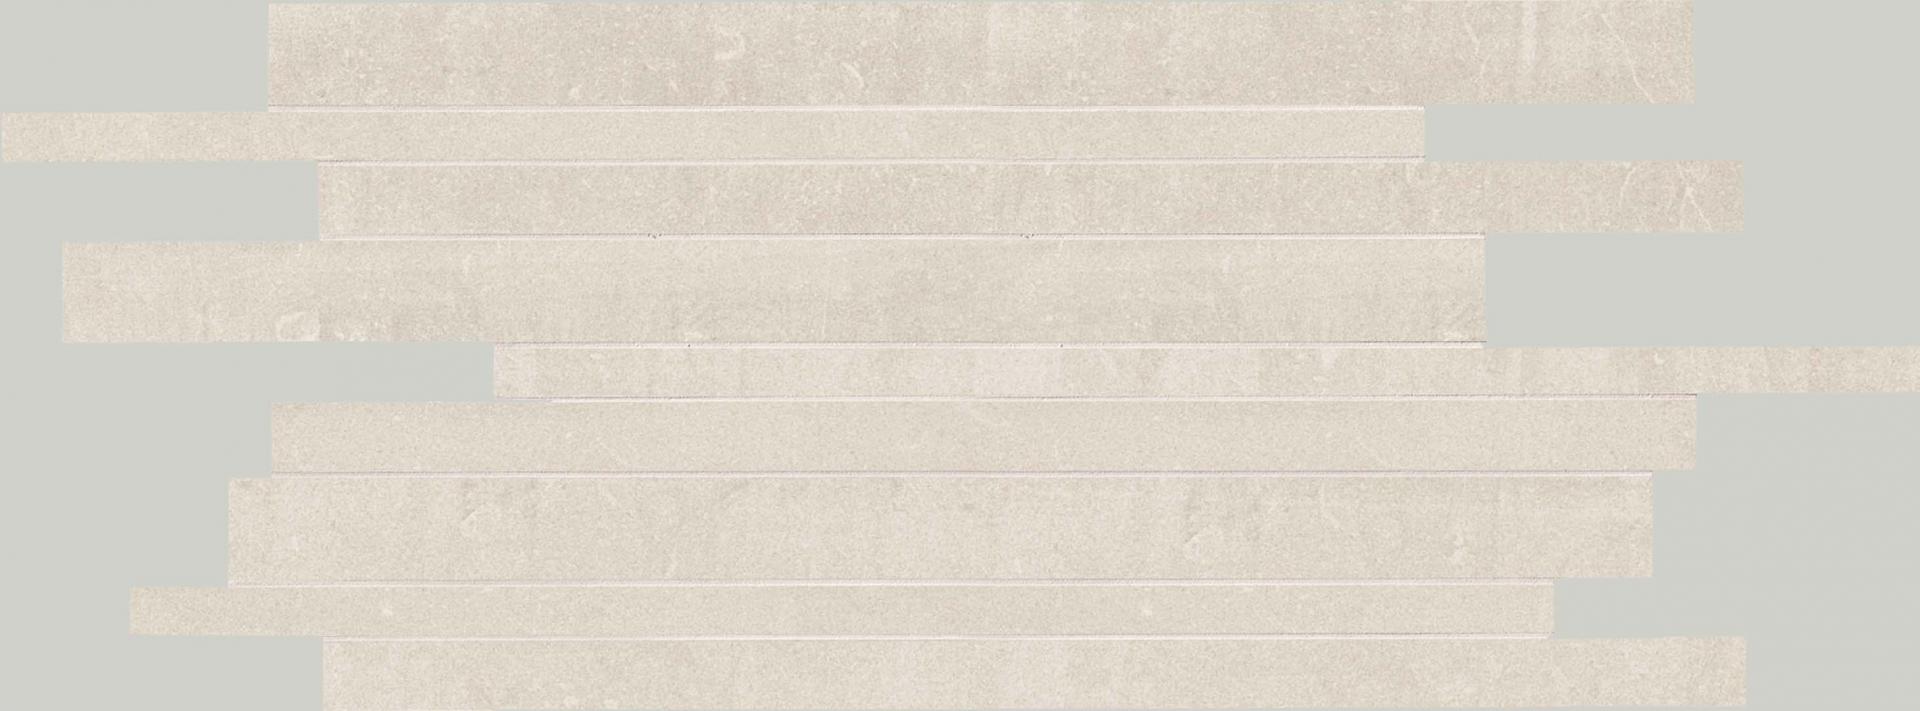 Keope BACK IVORY KE-y1T2 Strips 30X60 naturale R9